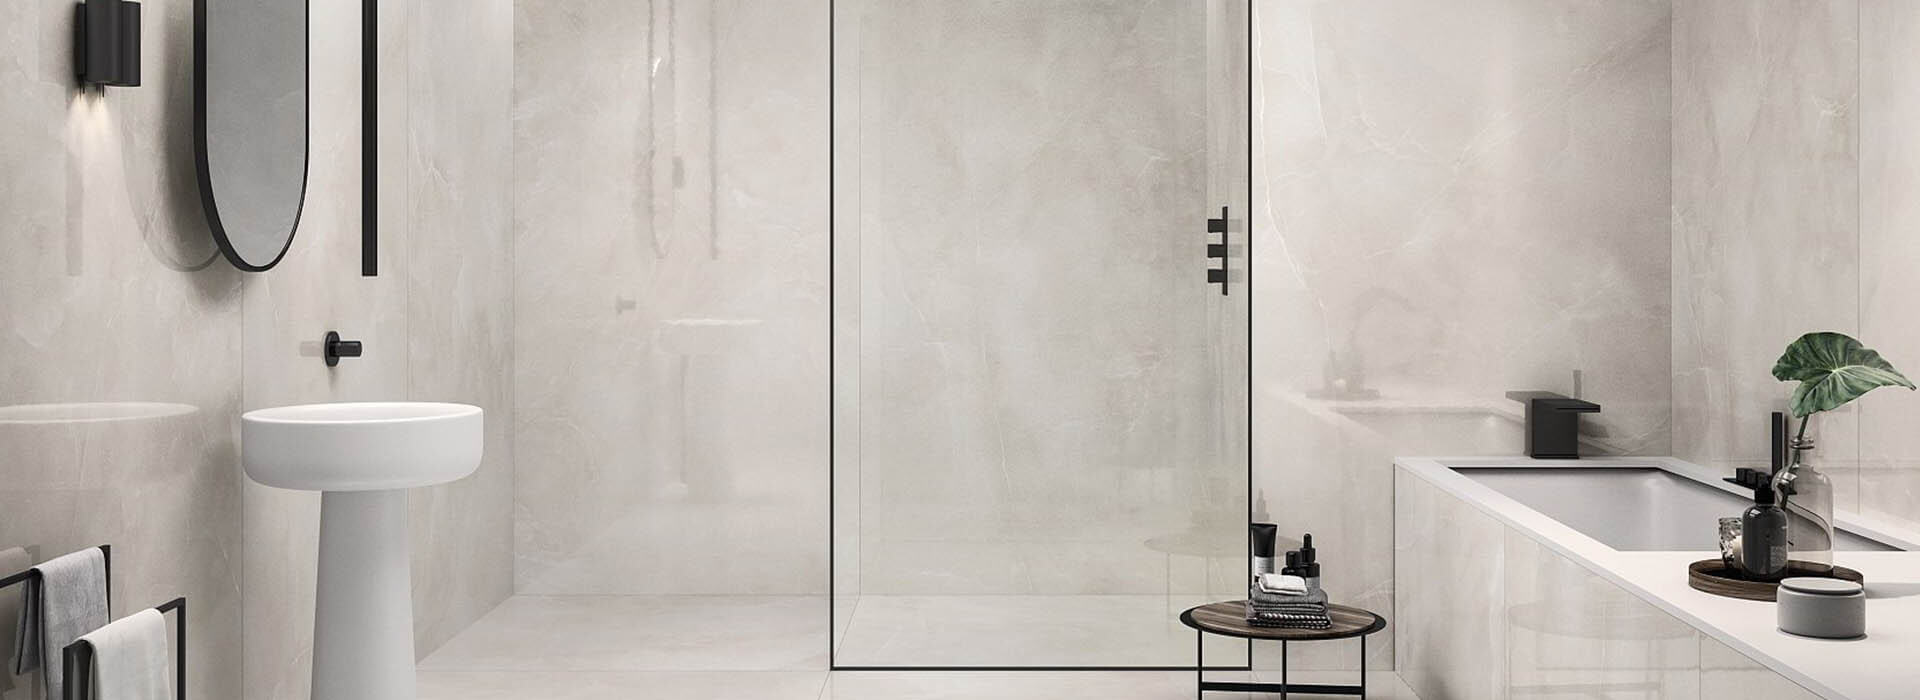 carrelage aspect marbre blanc